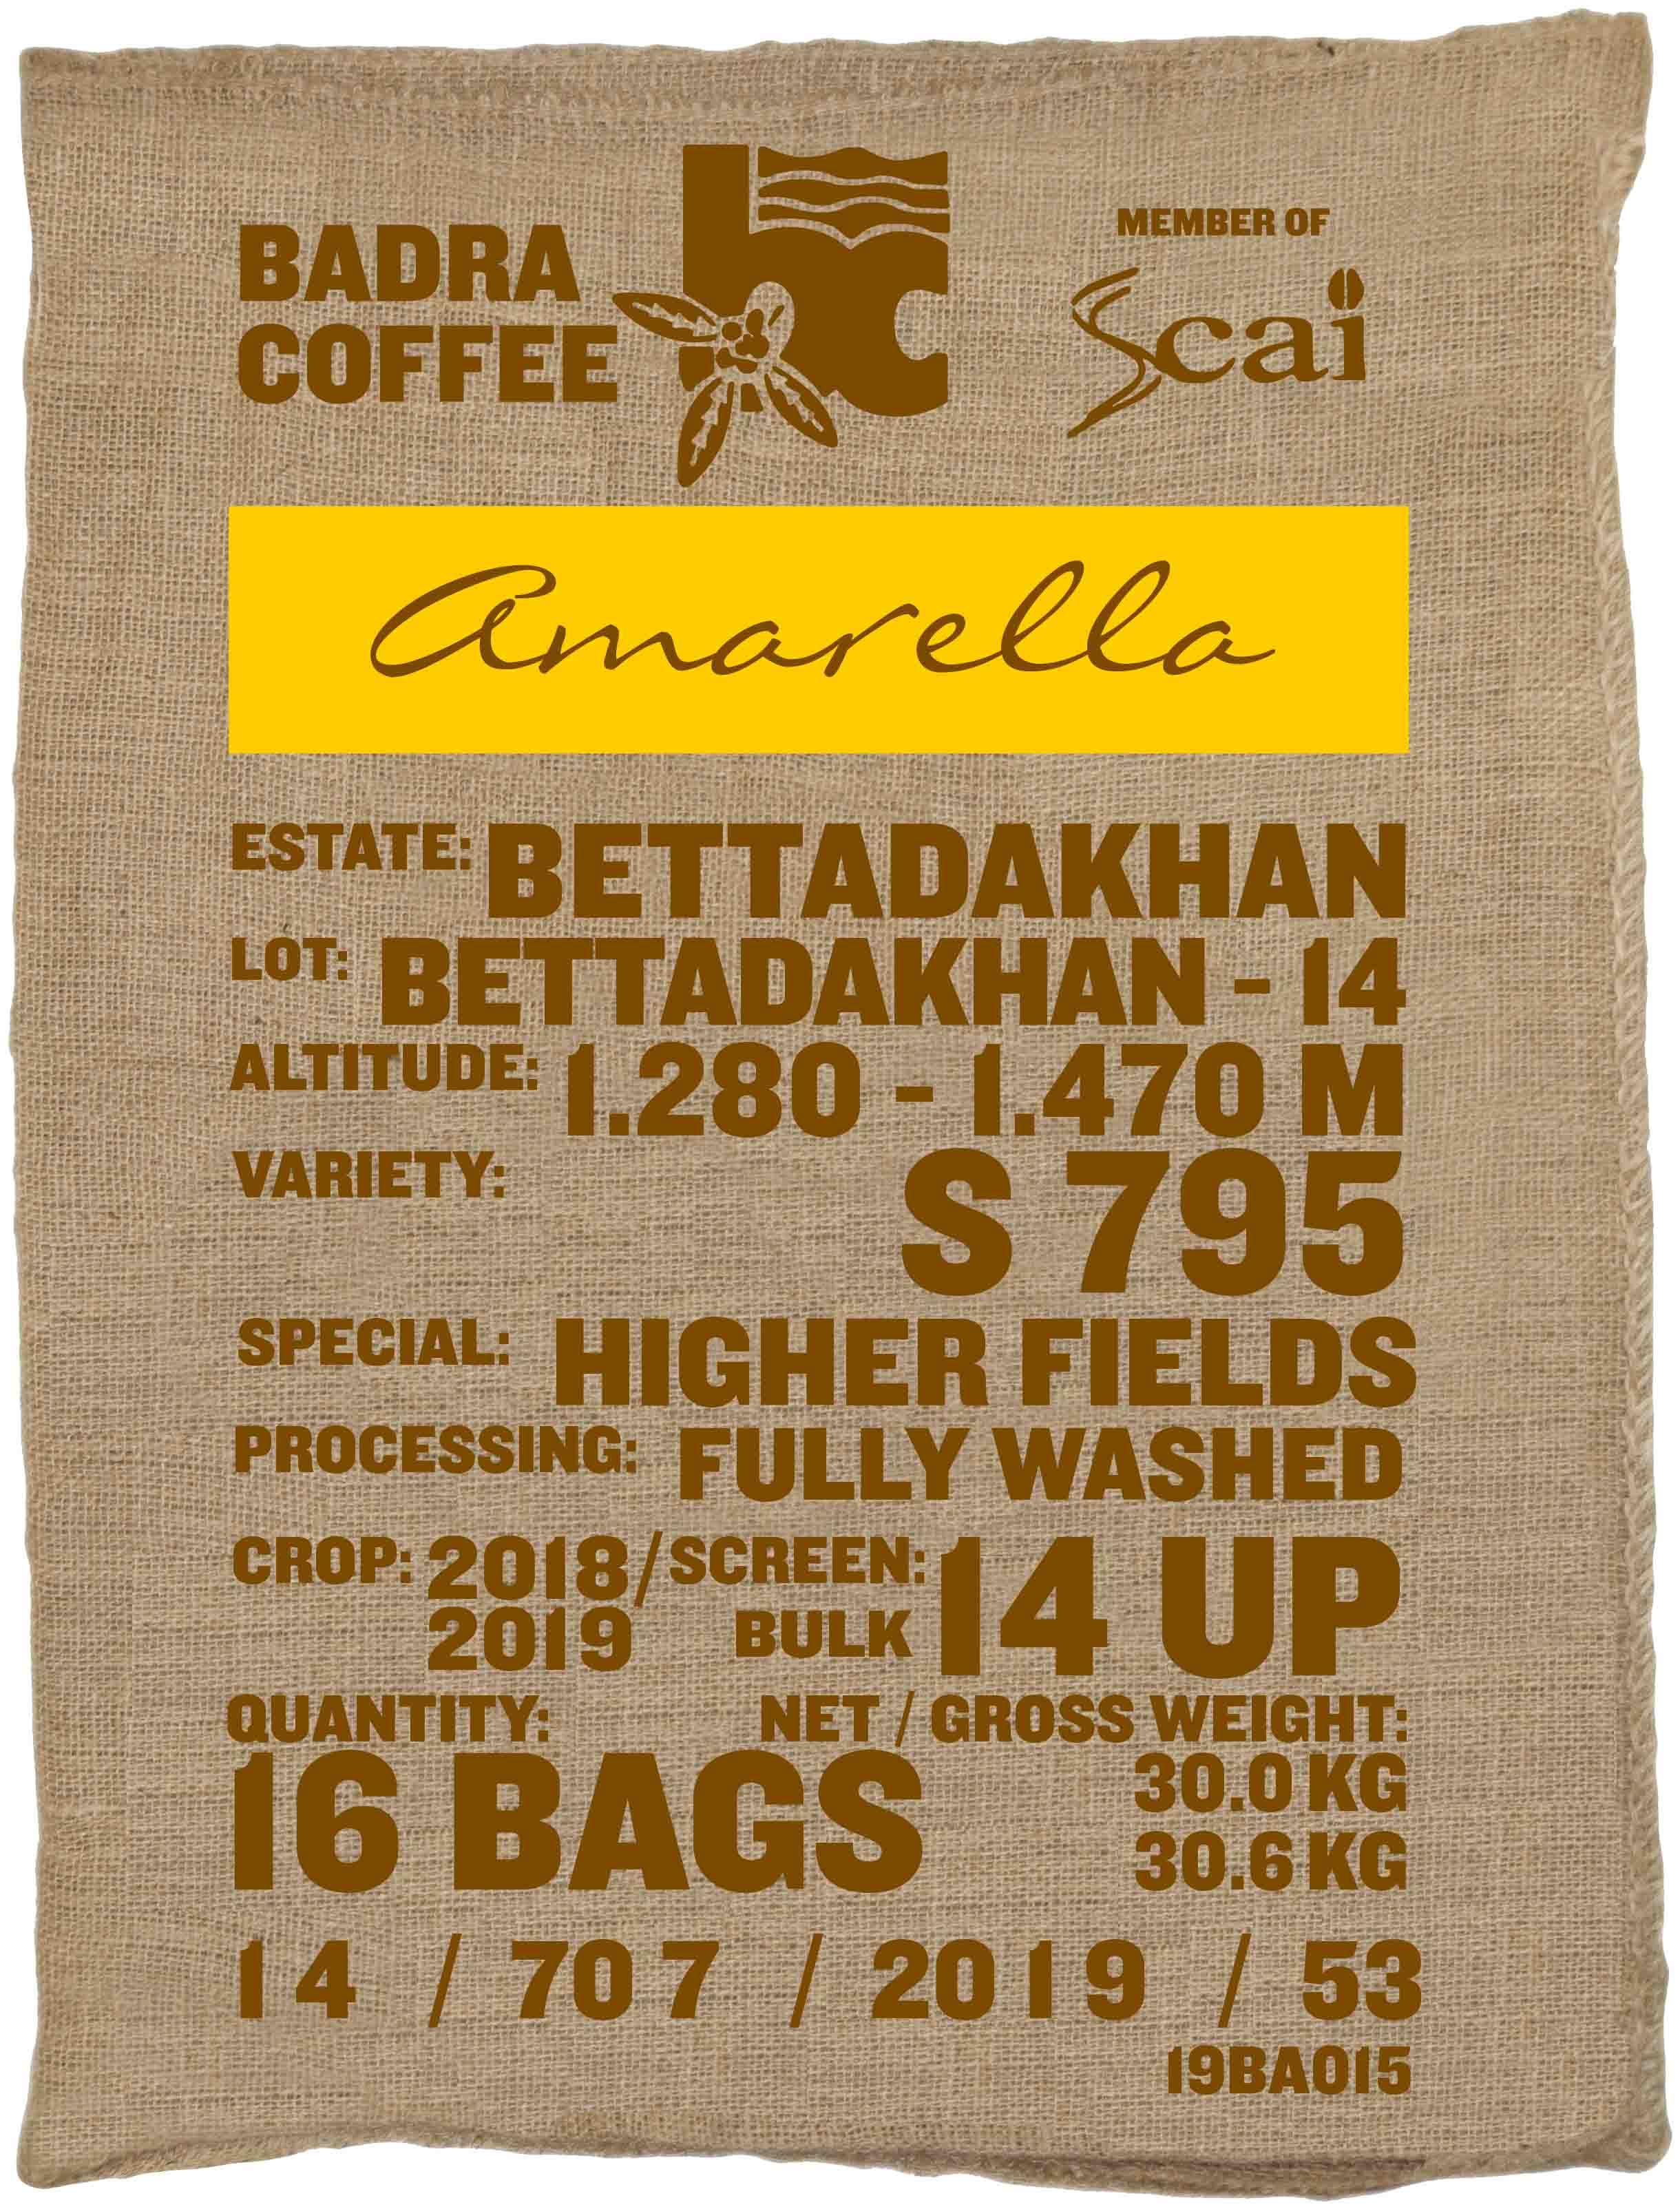 Ein Rohkaffeesack amarella Parzellenkaffee Varietät S795 Higher Fields. Badra Estates Lot Bettadakhan 14.